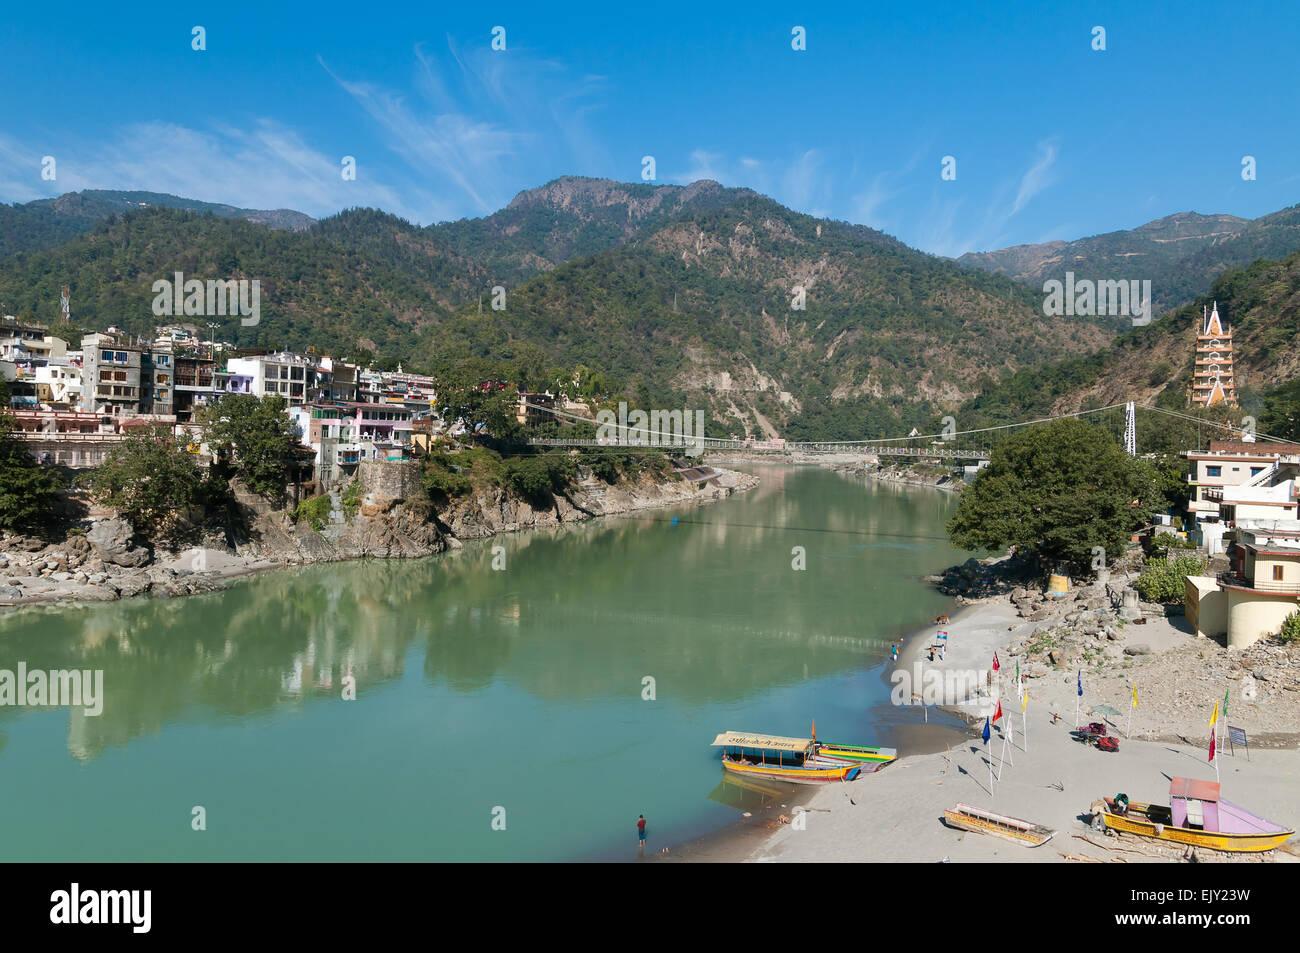 Laxman Jhula puente sobre el río Ganges. Rishikesh Imagen De Stock